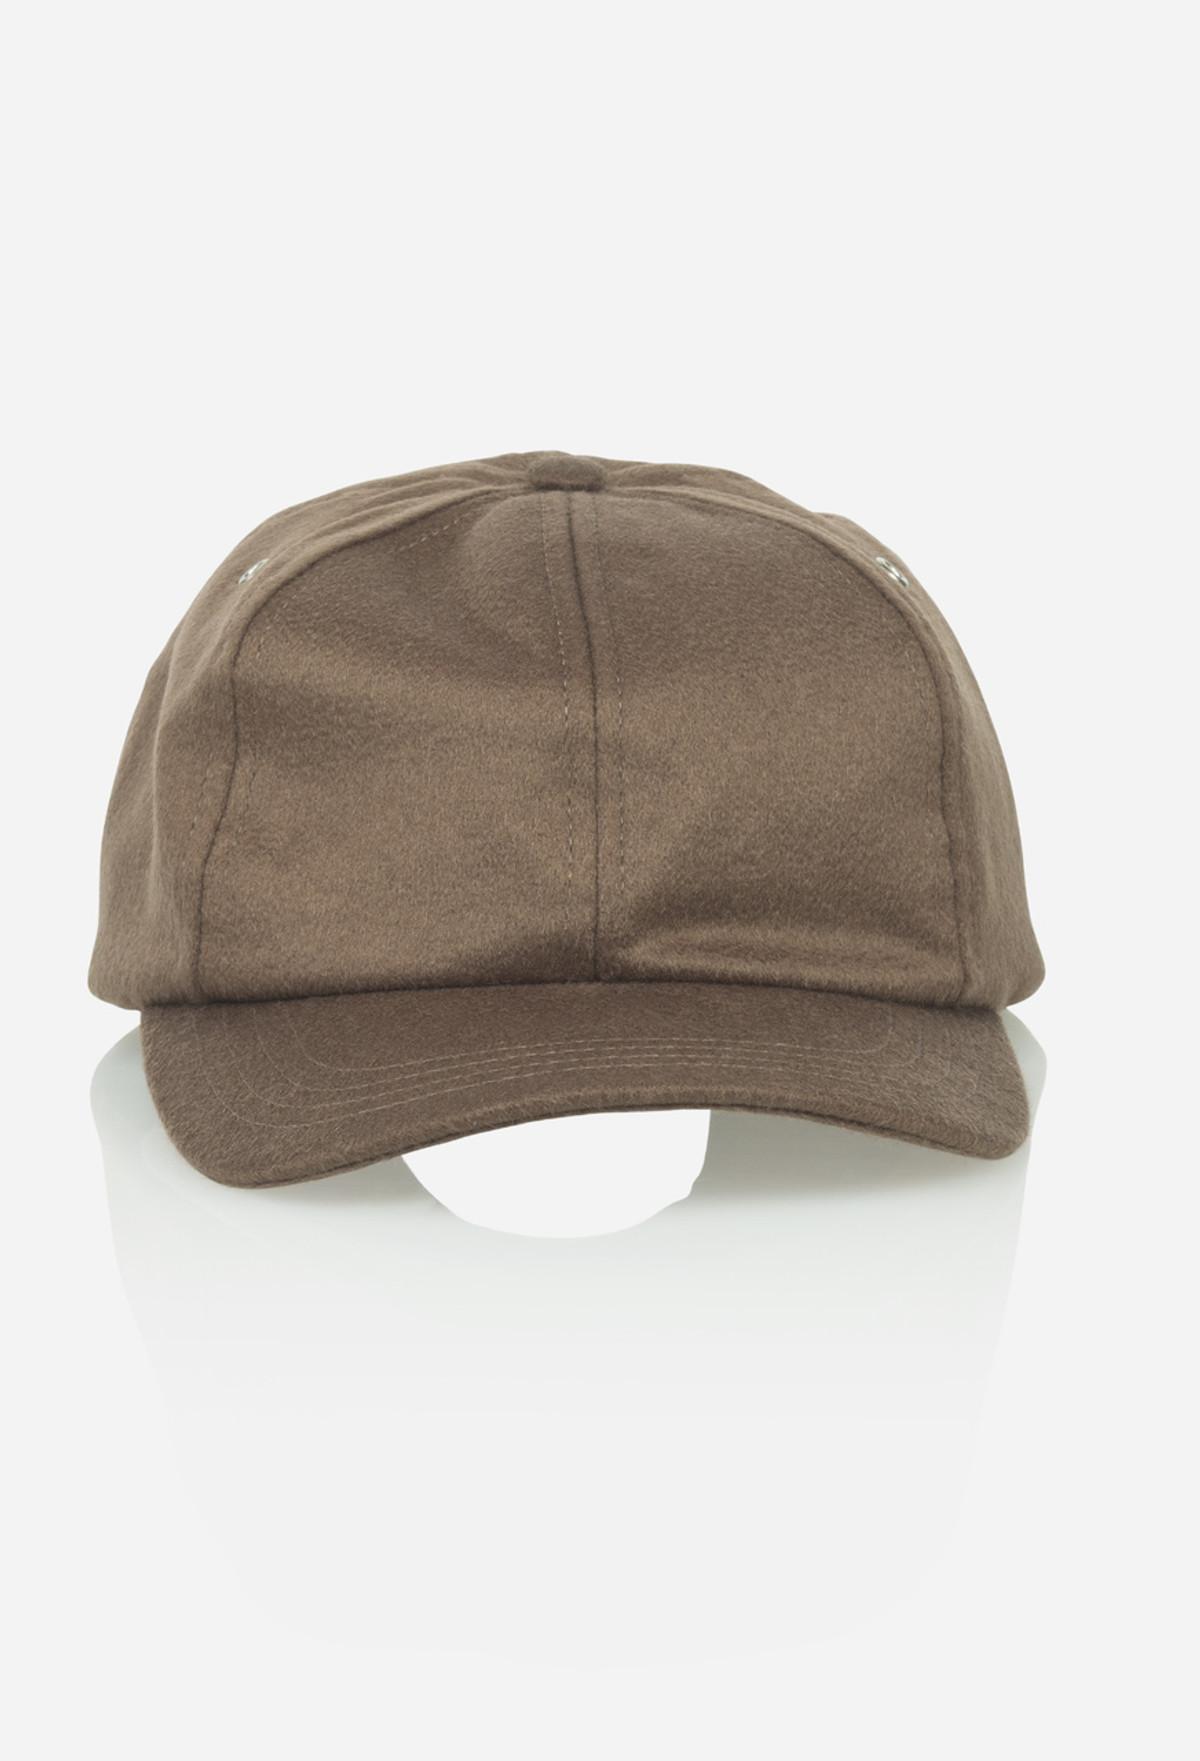 Camel Cashmere Baseball Cap